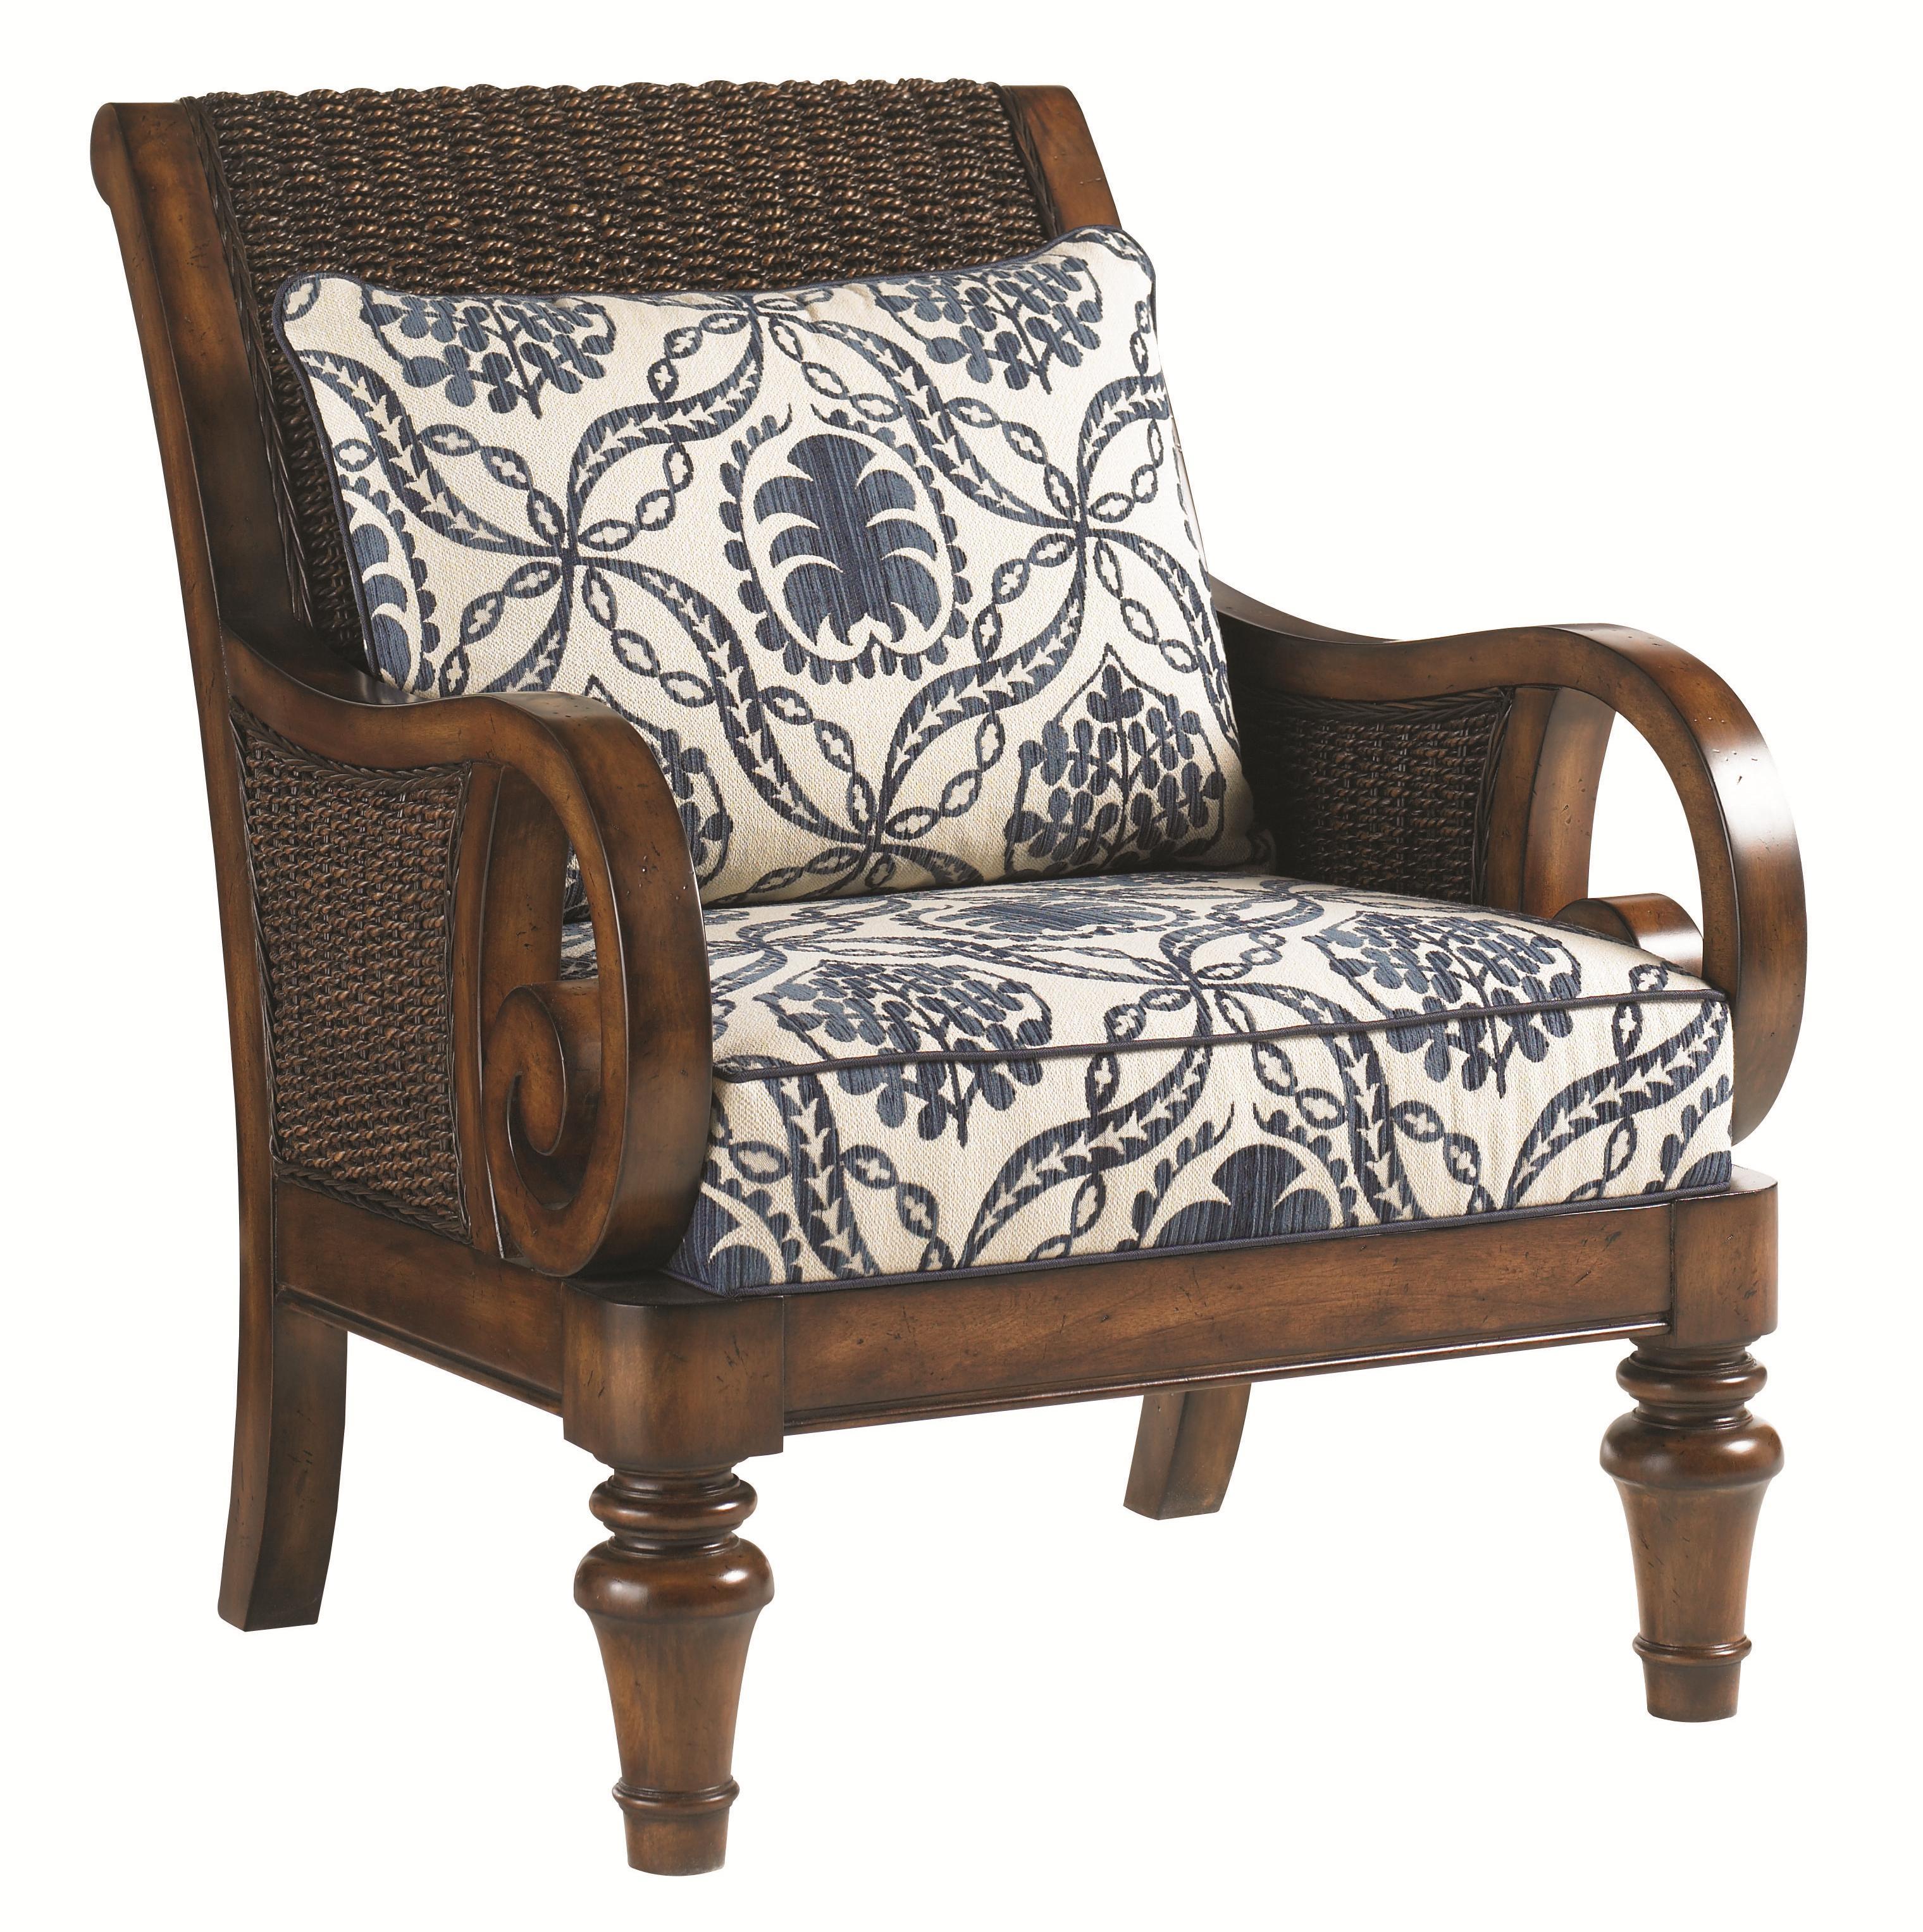 Lexington Upholstery Marin Chair by Lexington at Johnny Janosik